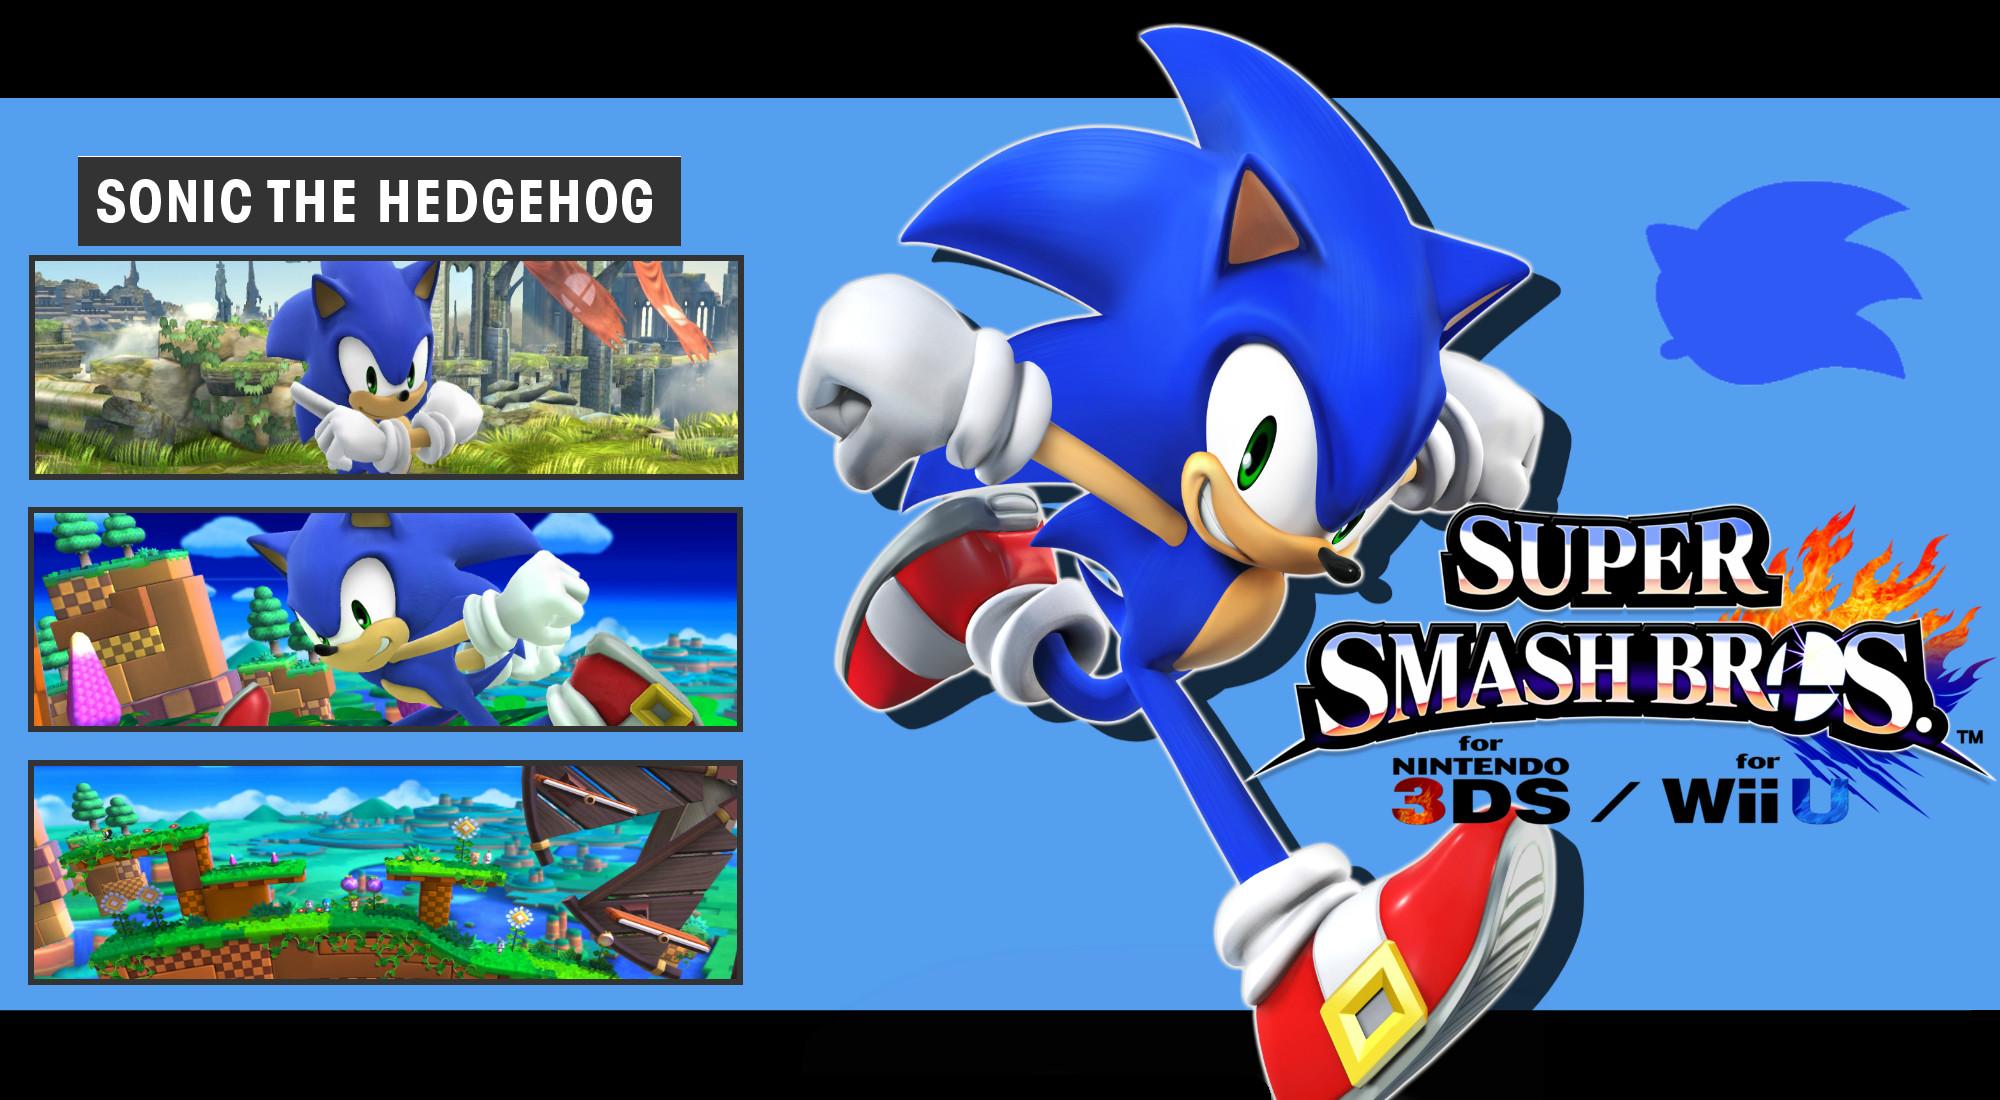 … DaKidGaming Super Smash Bros. 3DS/Wii U – Sonic Wallpaper by DaKidGaming